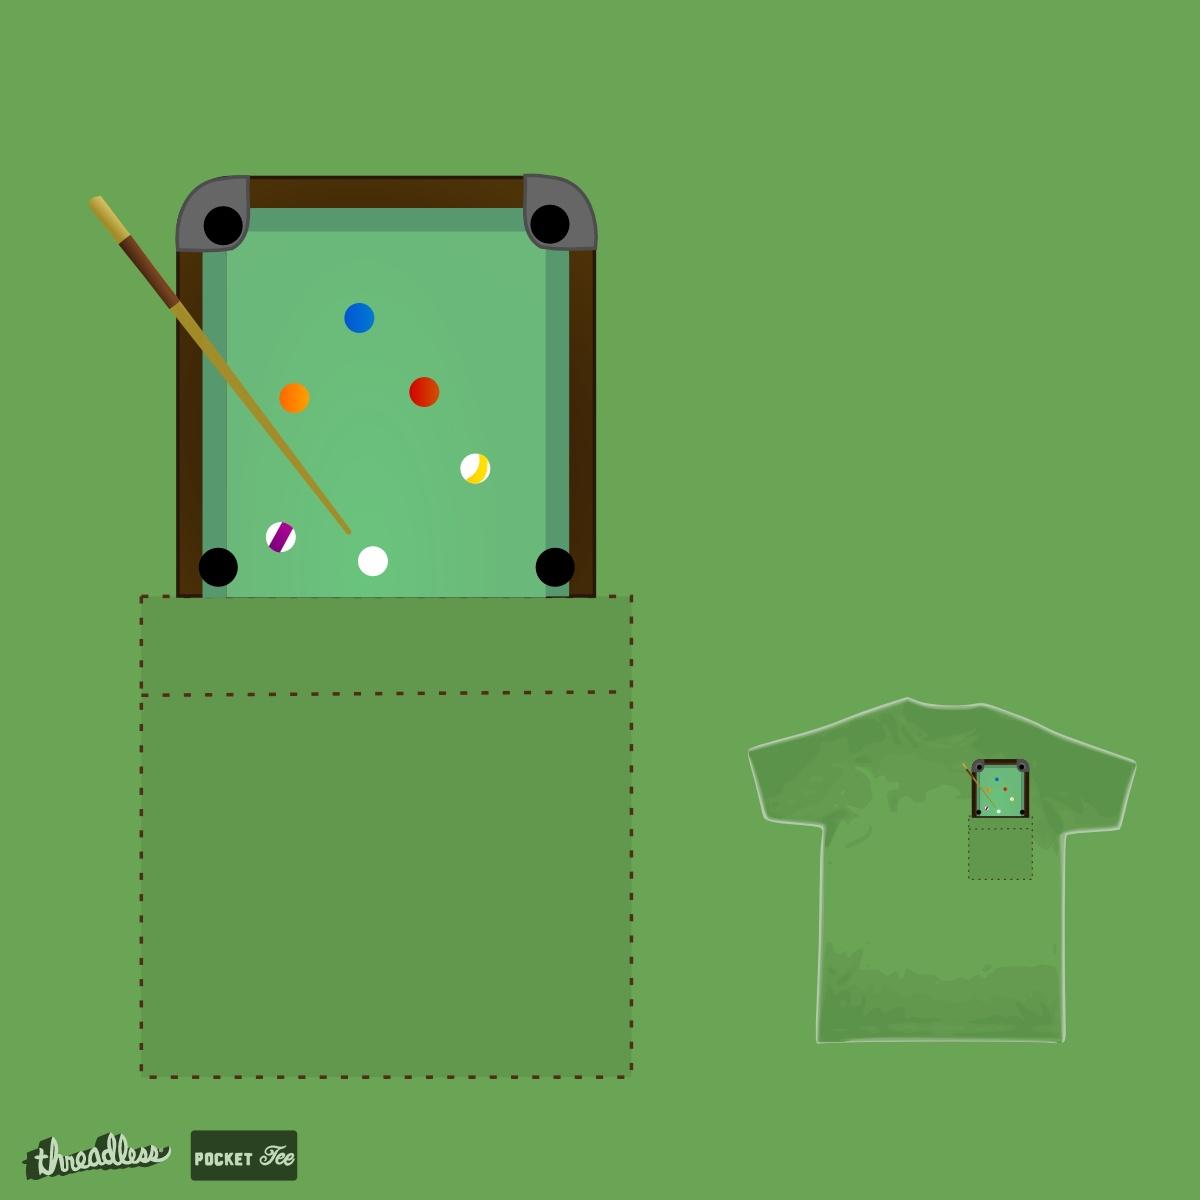 Pocket Pool by TRYBYK on Threadless